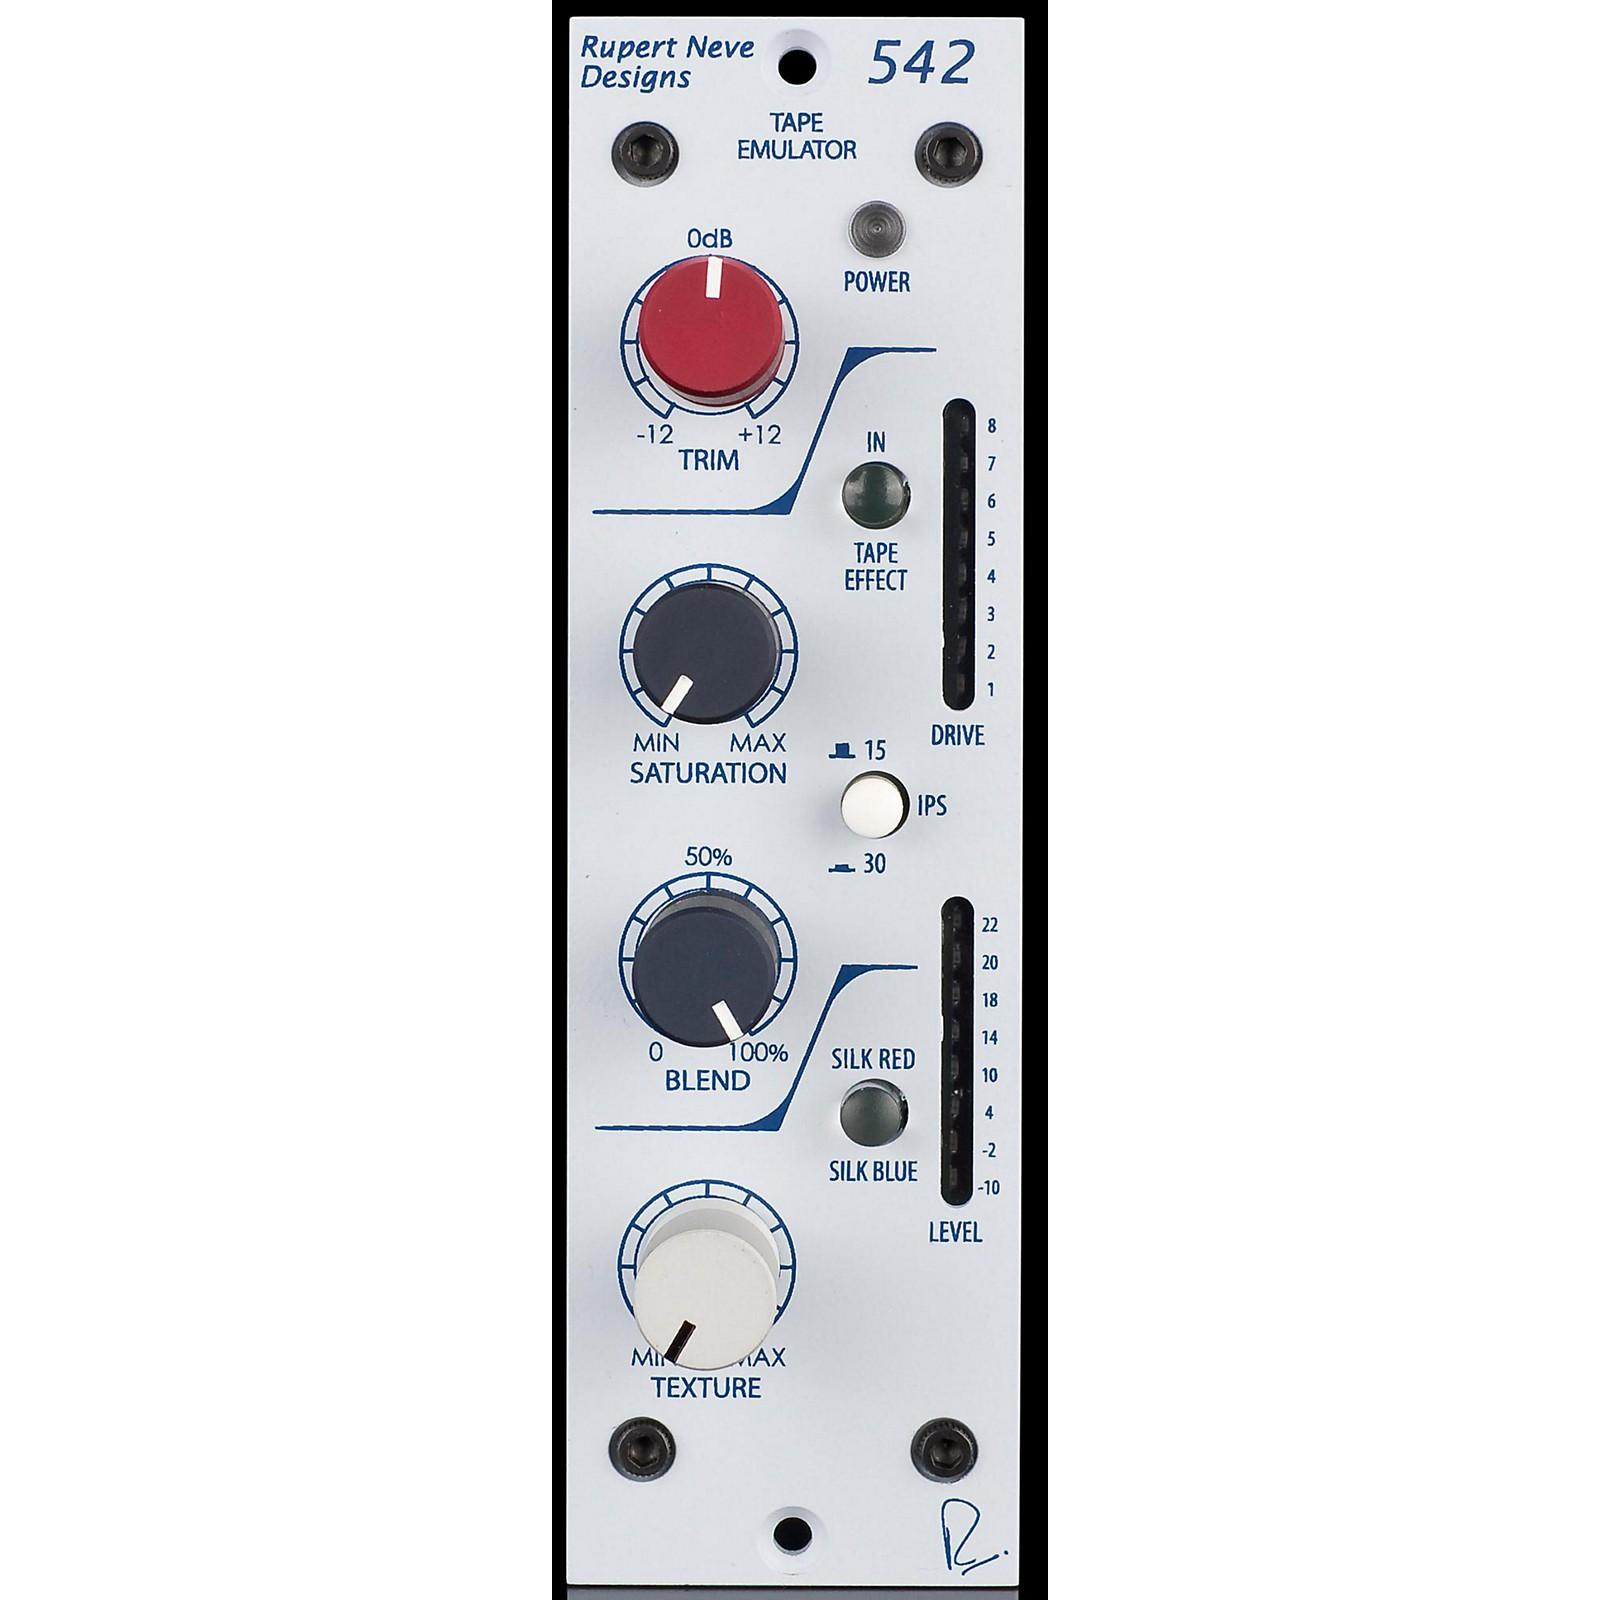 Rupert Neve Designs Portico 542 500 Series Tape FX